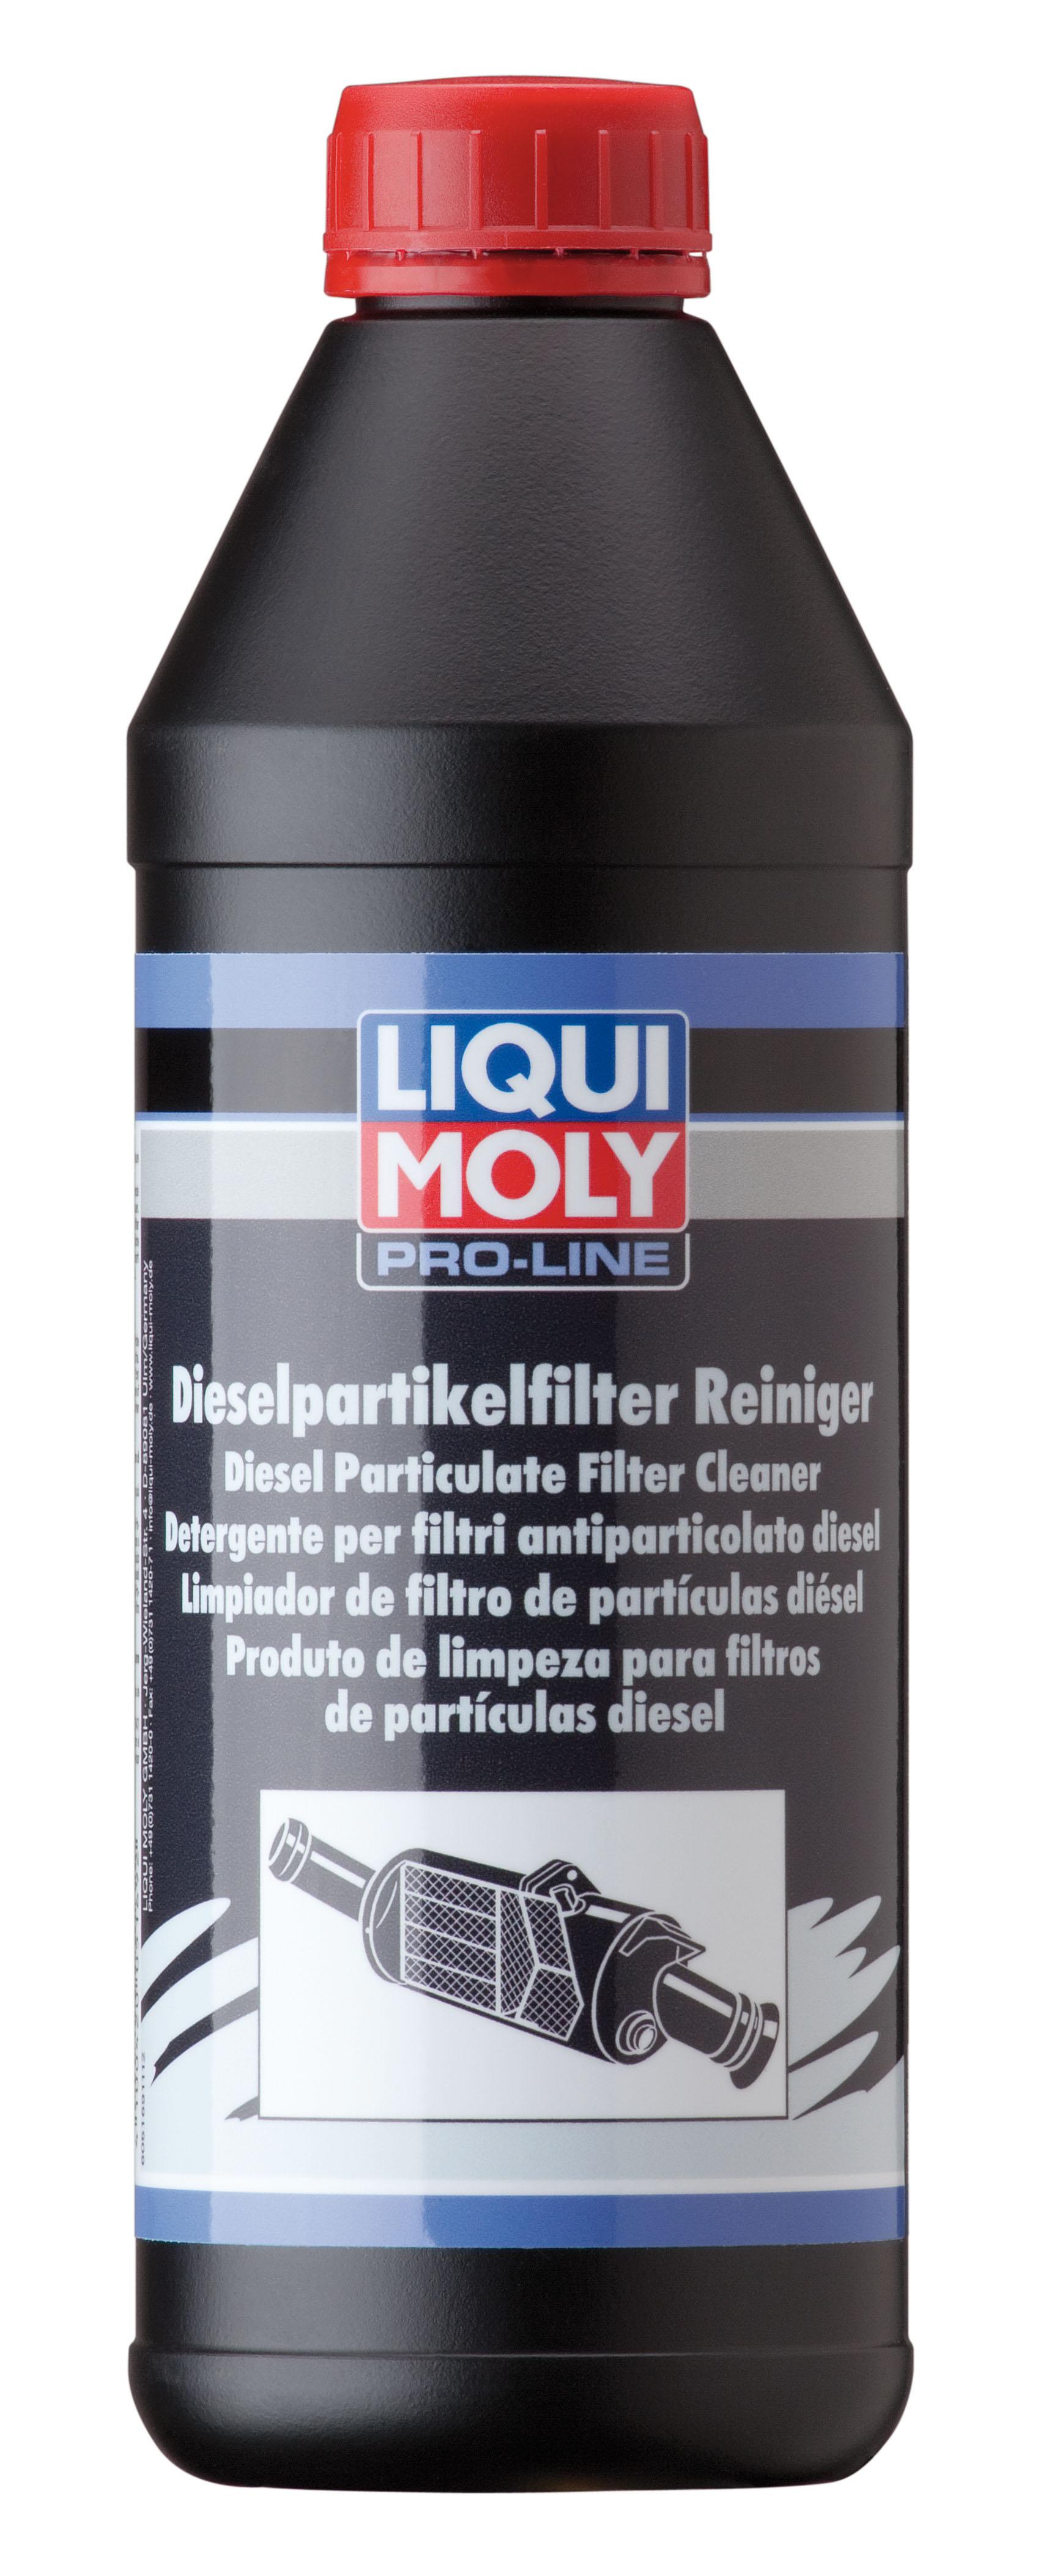 motoroel king liqui moly pro line diesel partikelfilter reiniger 1 liter. Black Bedroom Furniture Sets. Home Design Ideas